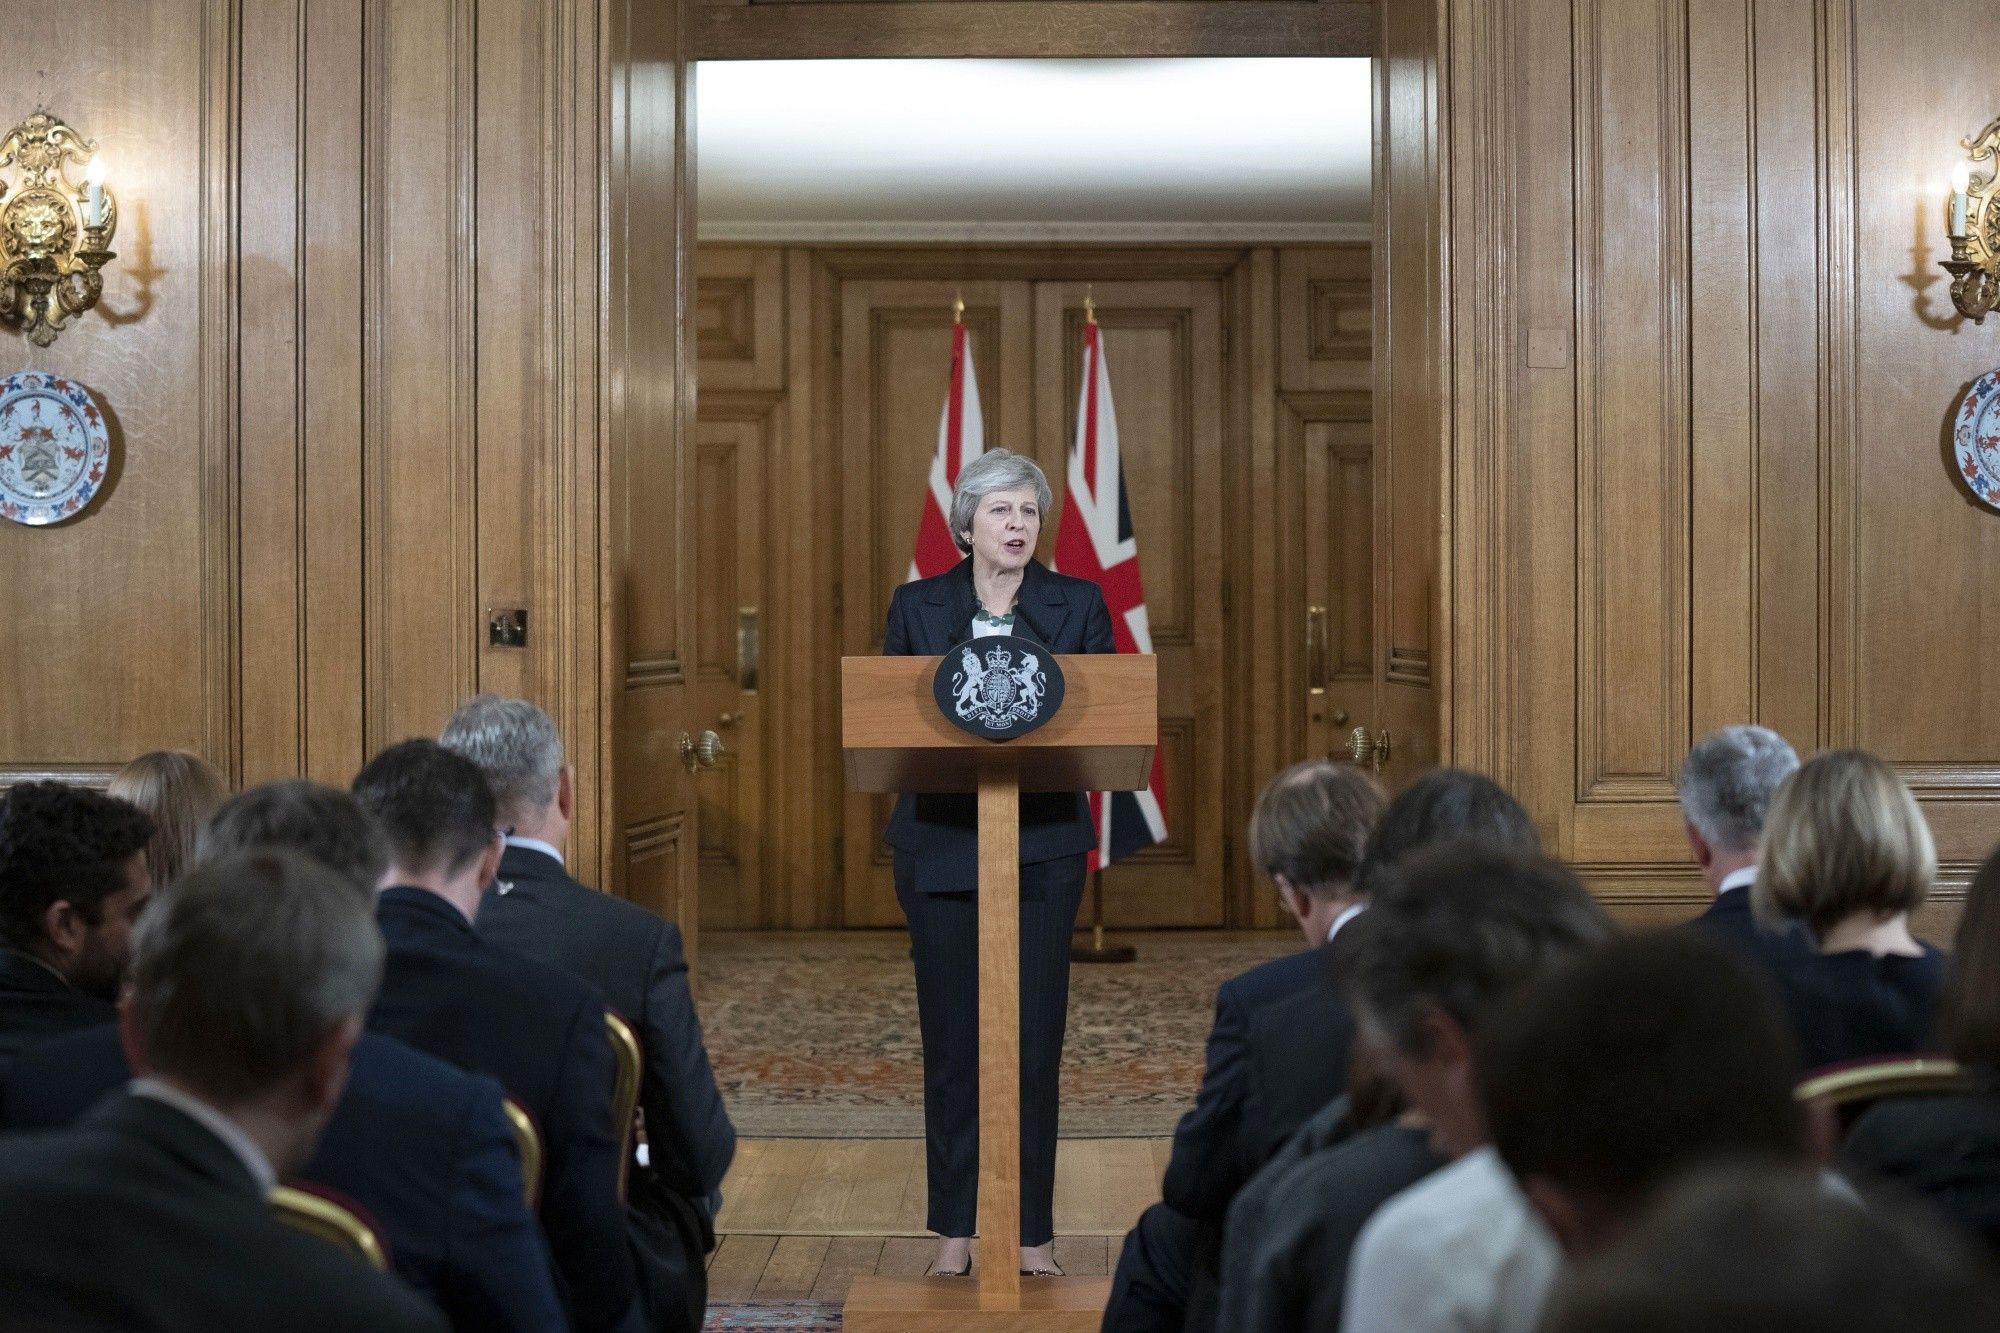 May's Brexit Plan Thrown Into Crisis Following U.K. Brexit Secretary Resignation